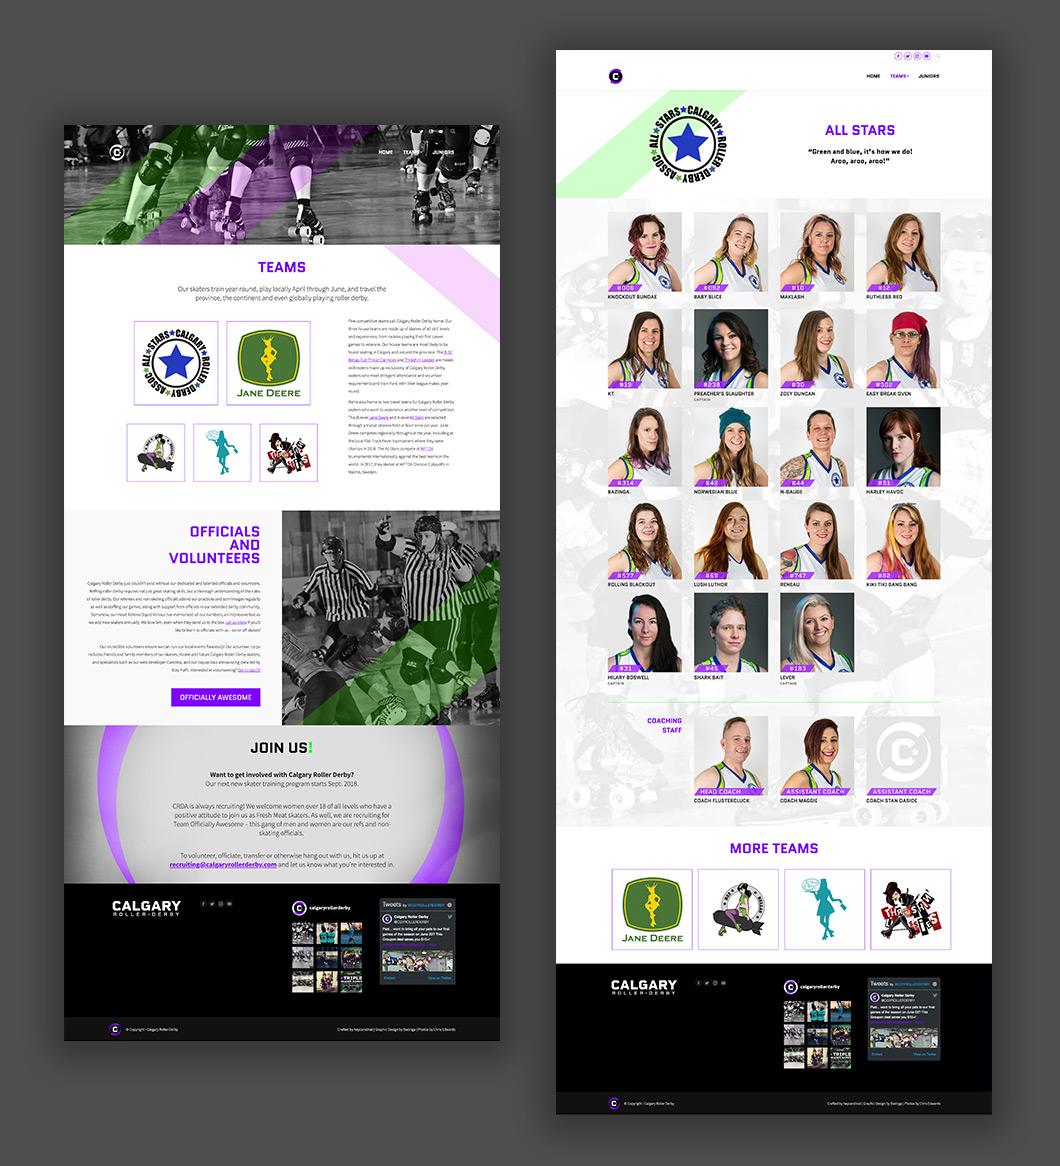 Calgary Roller Derby website design, graphic design, web development, wordpress, teams pages